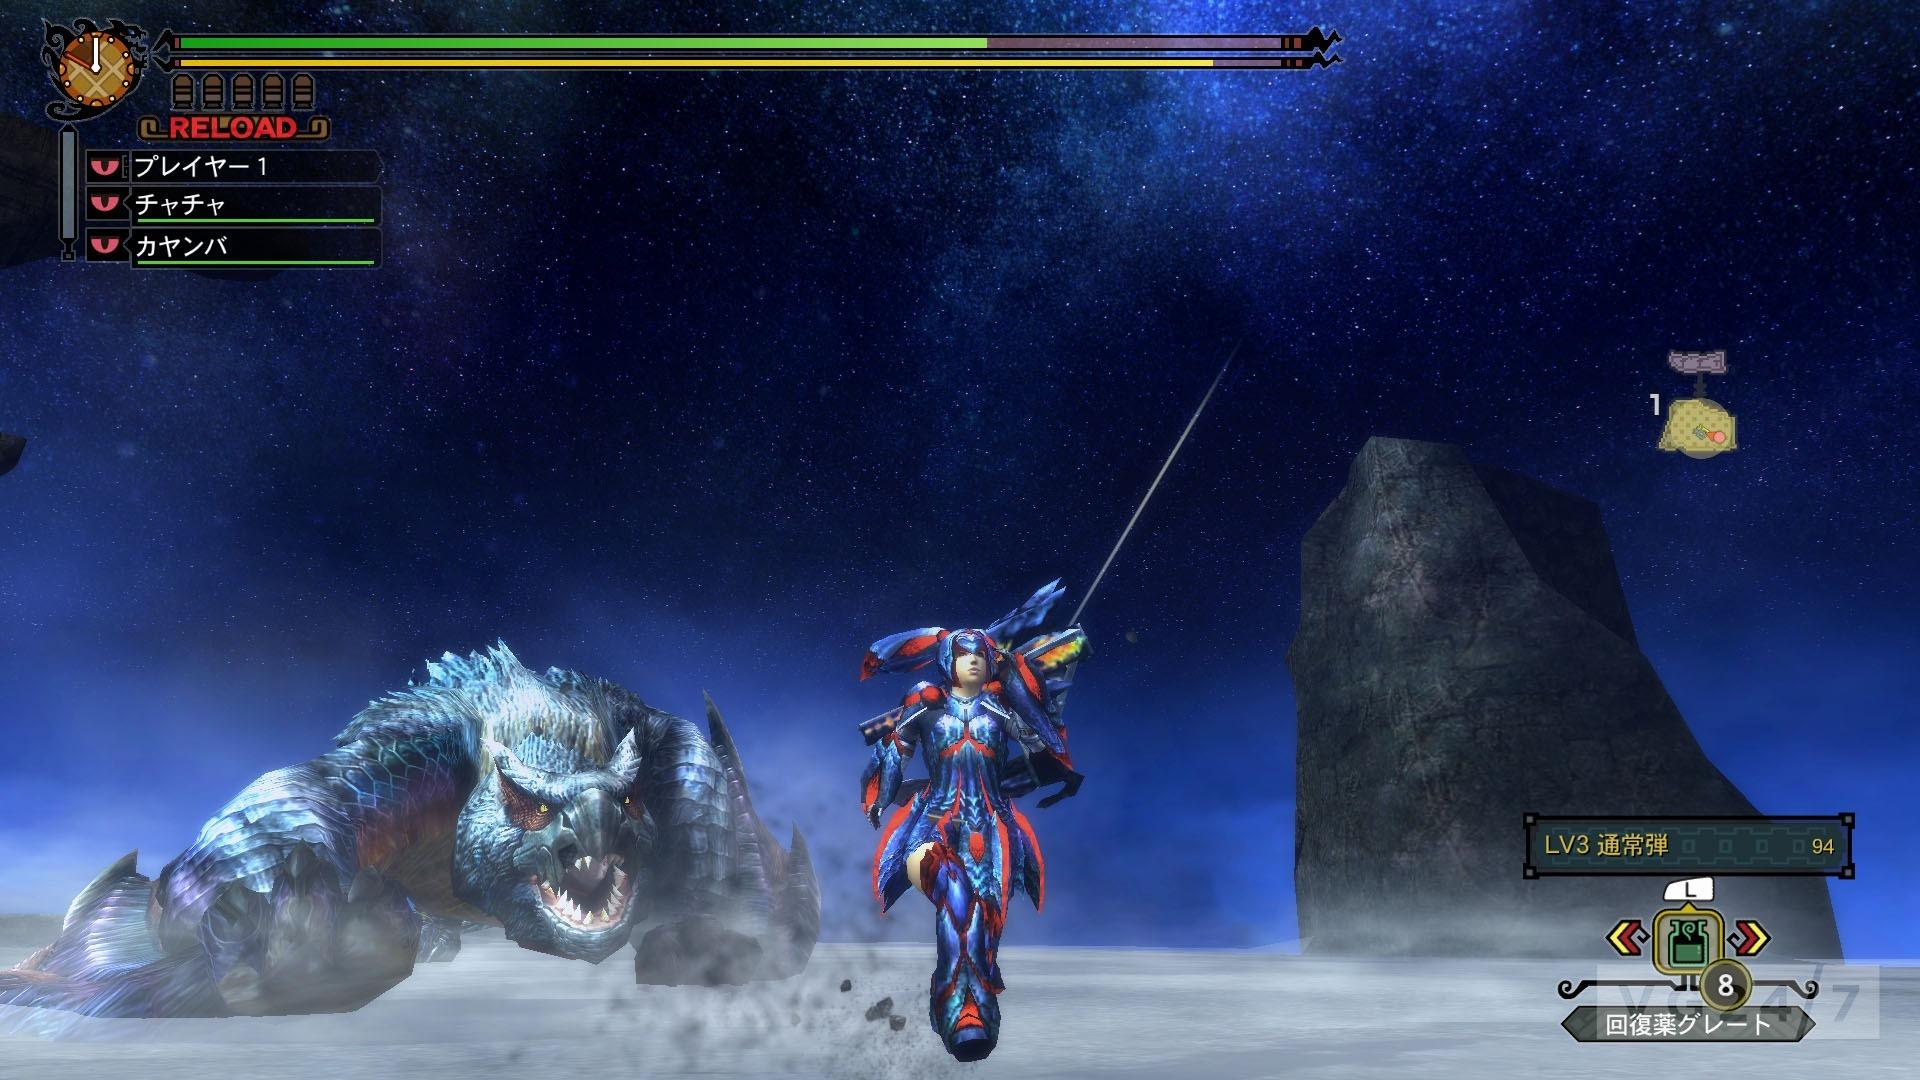 Monster Hunter 3 Ultimate Review - IGN